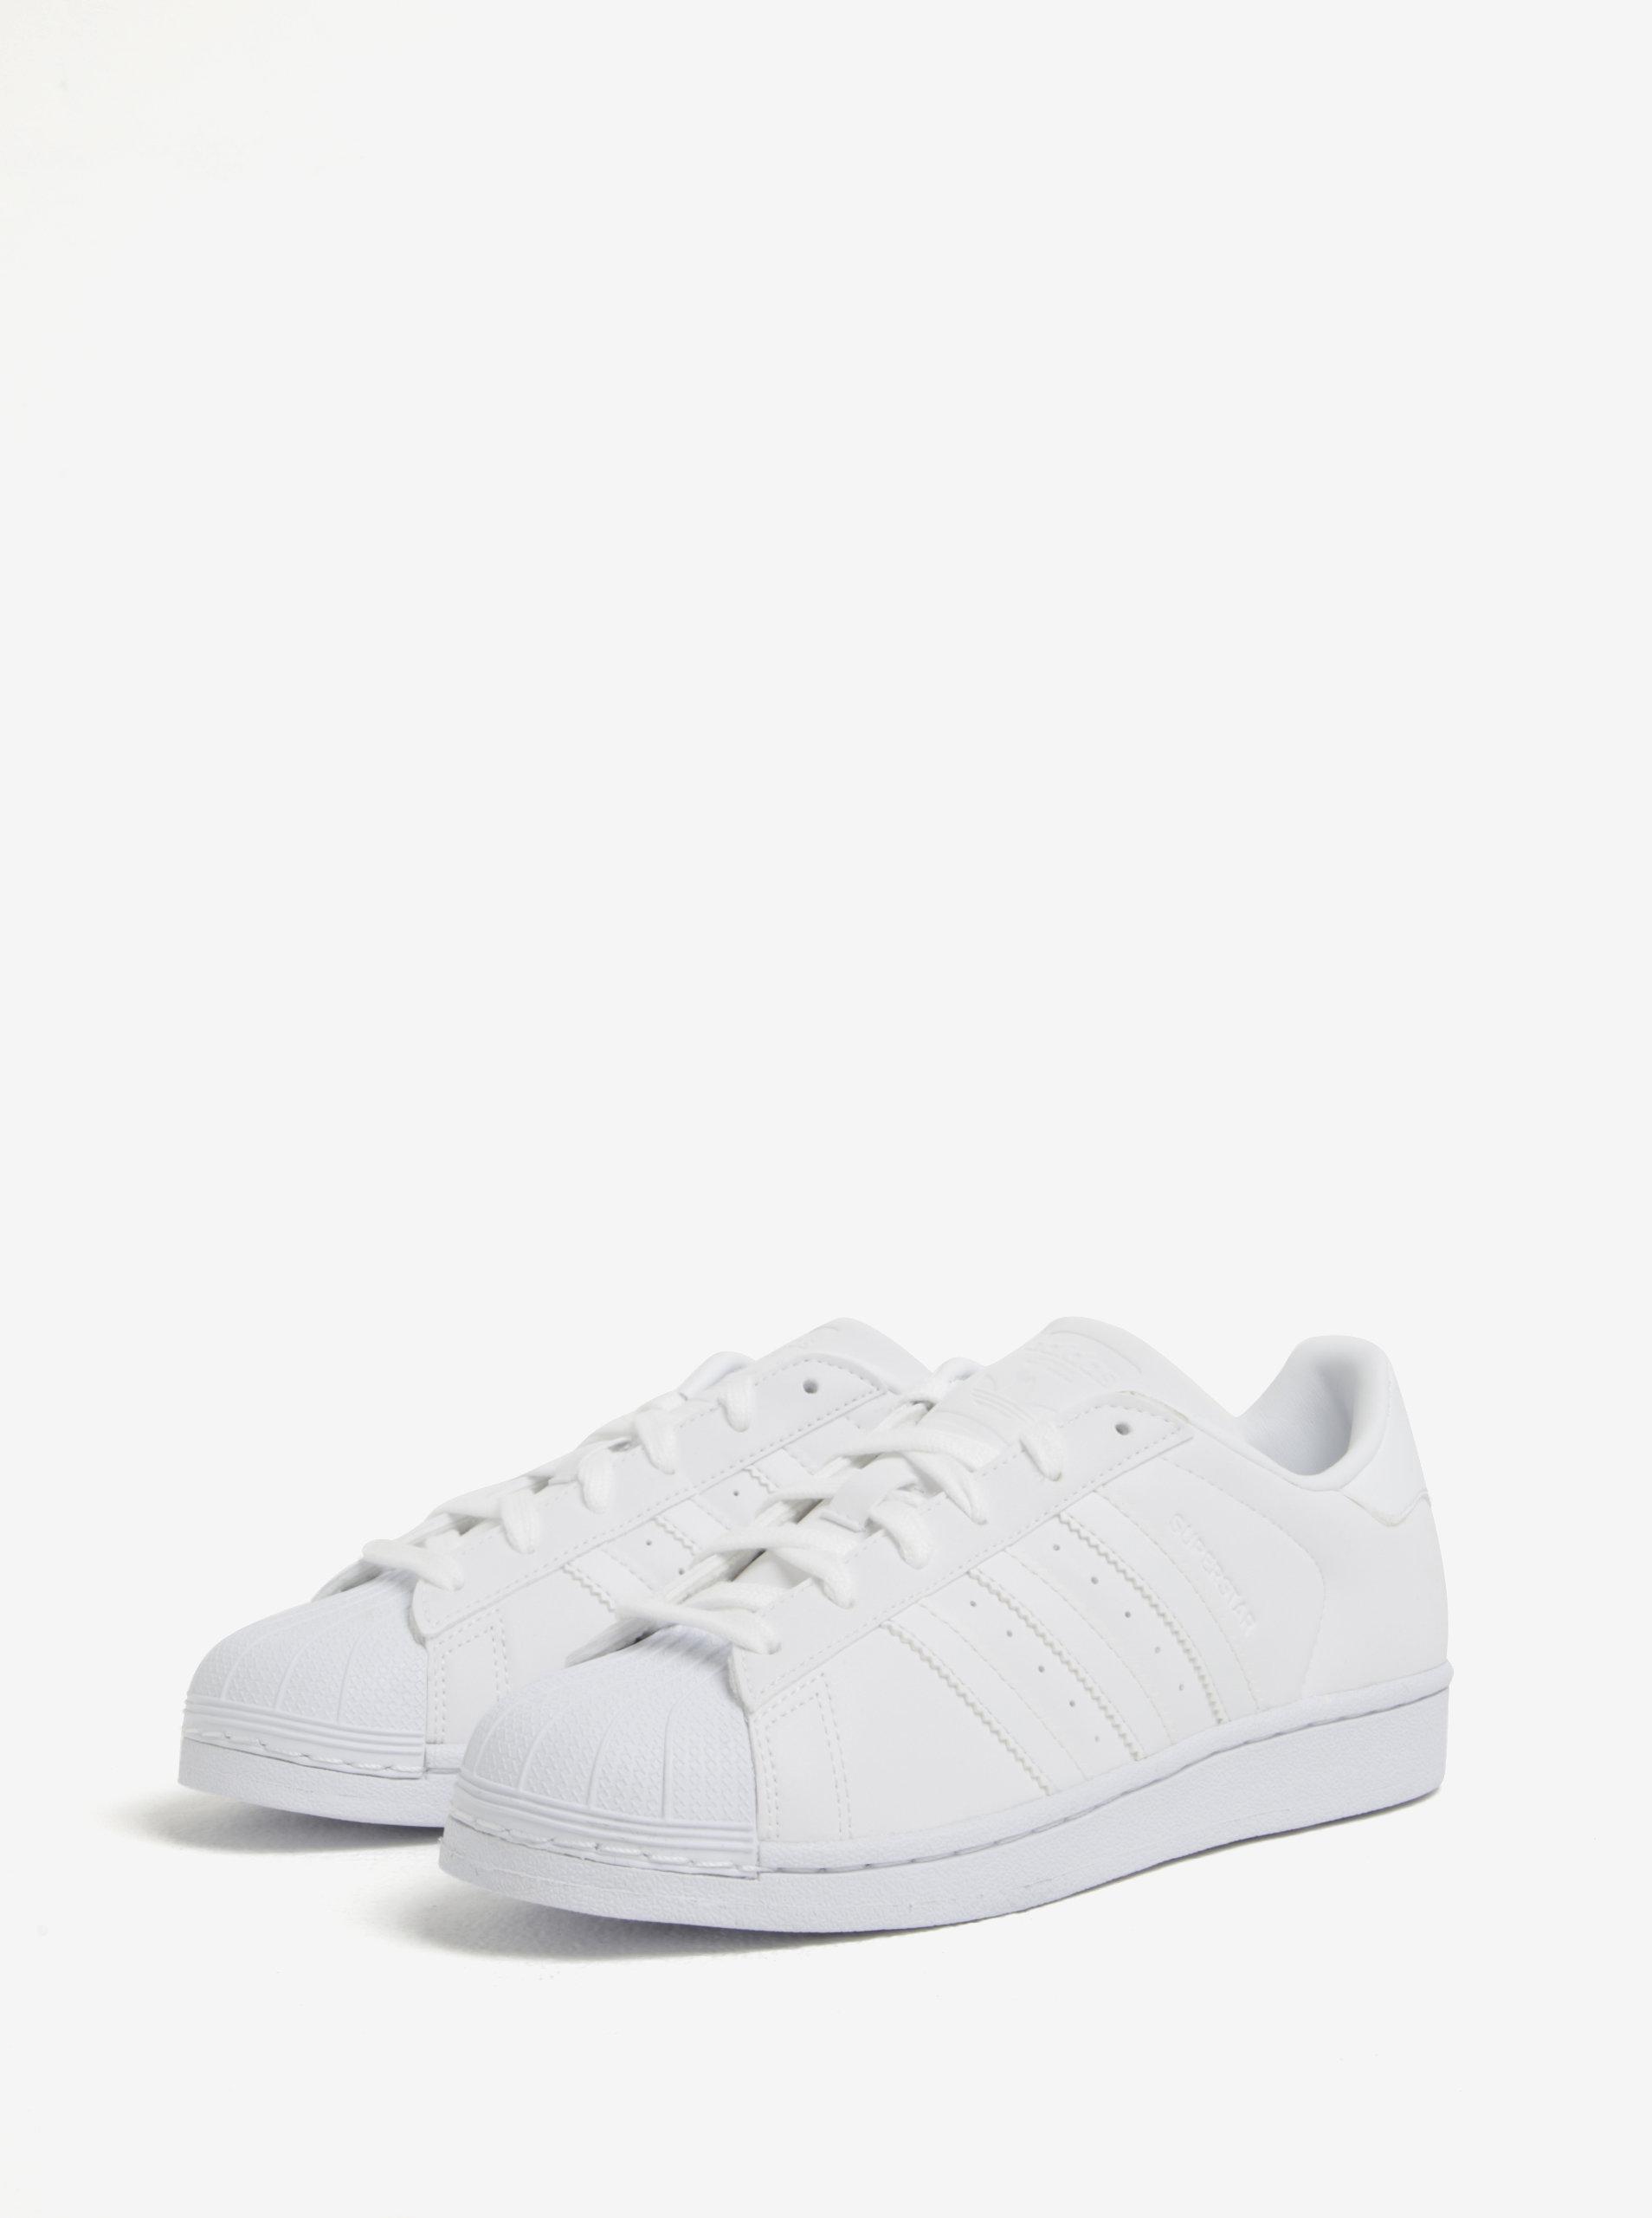 1100cf70852c Biele dámske tenisky adidas Originals Superstar ...